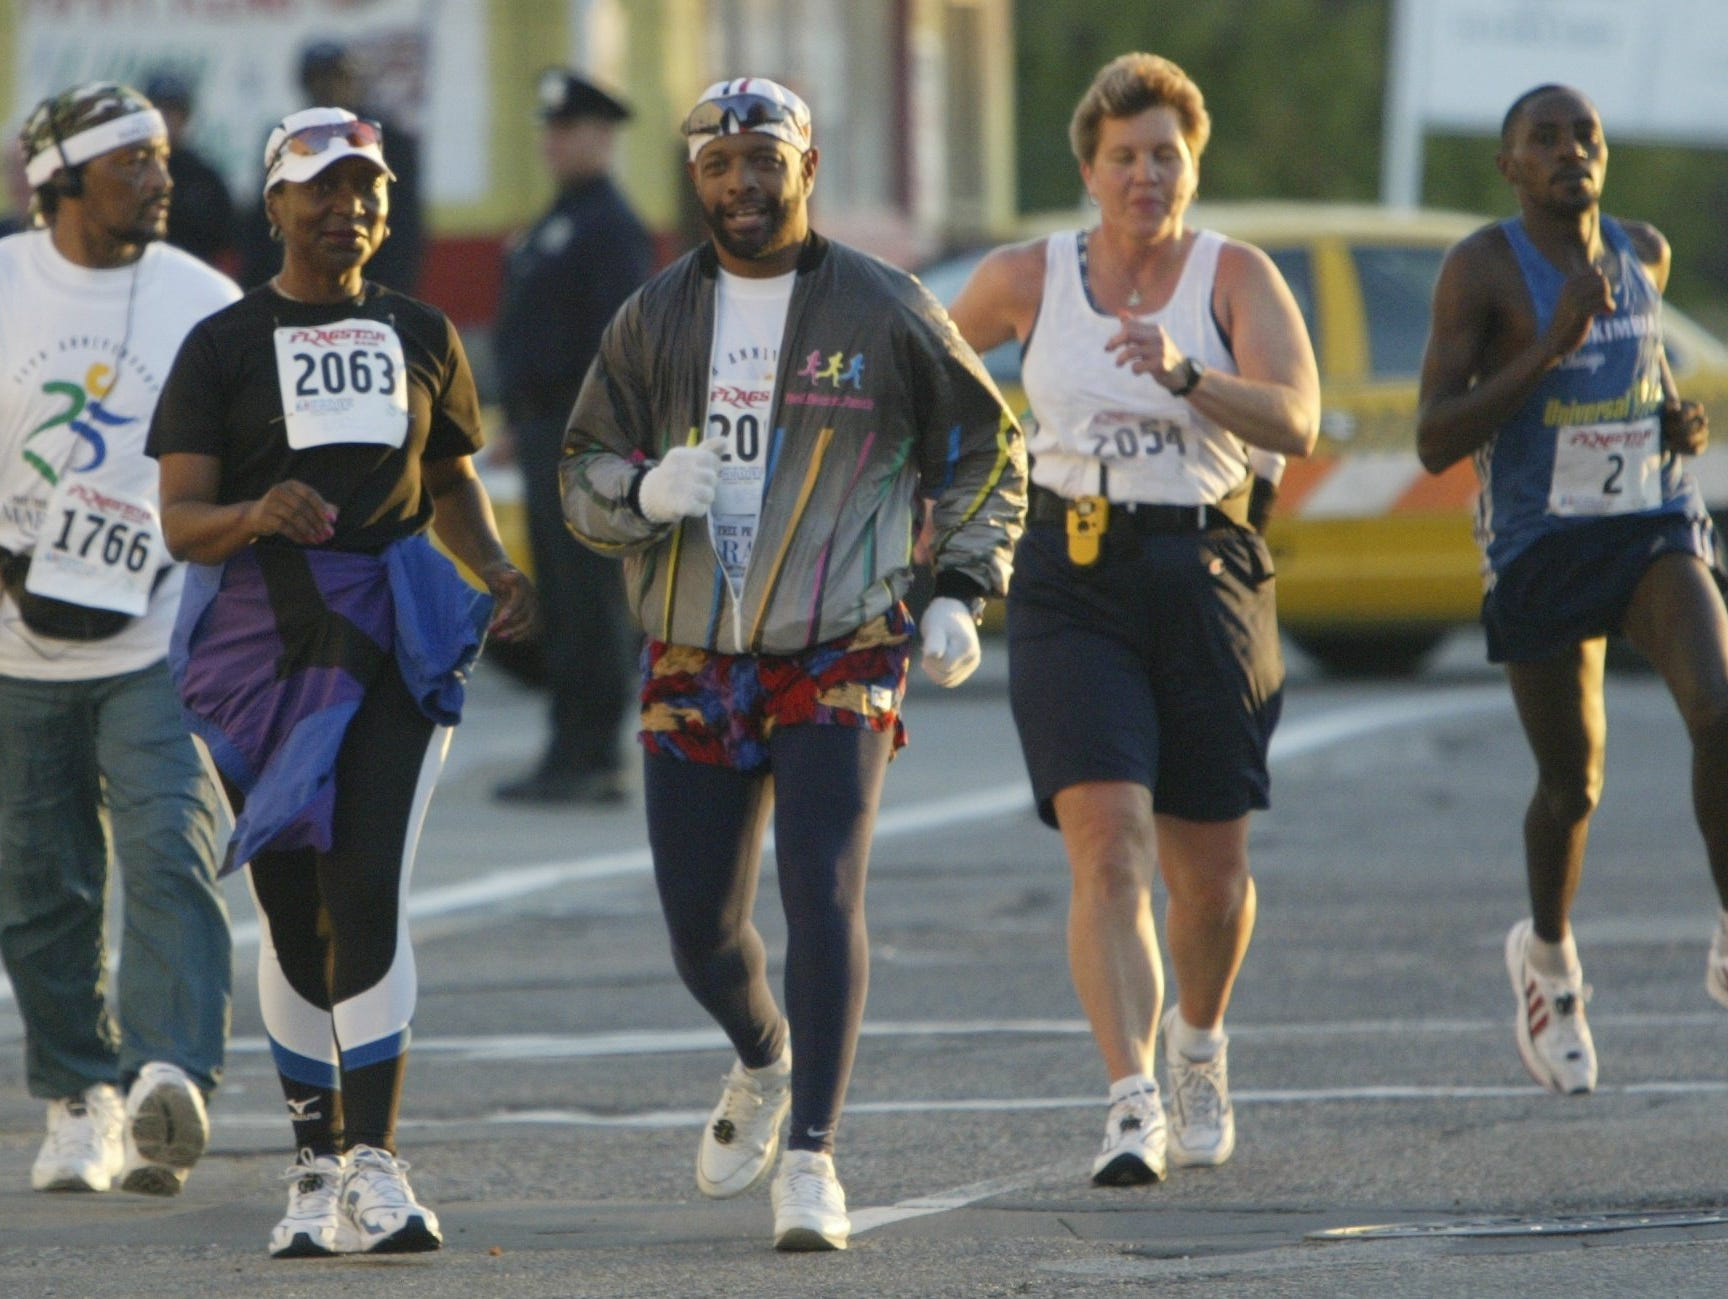 Participants in downtown Detroit as the 25th Detroit Free Press/Flagstar Bank Marathon got under way in 2002.